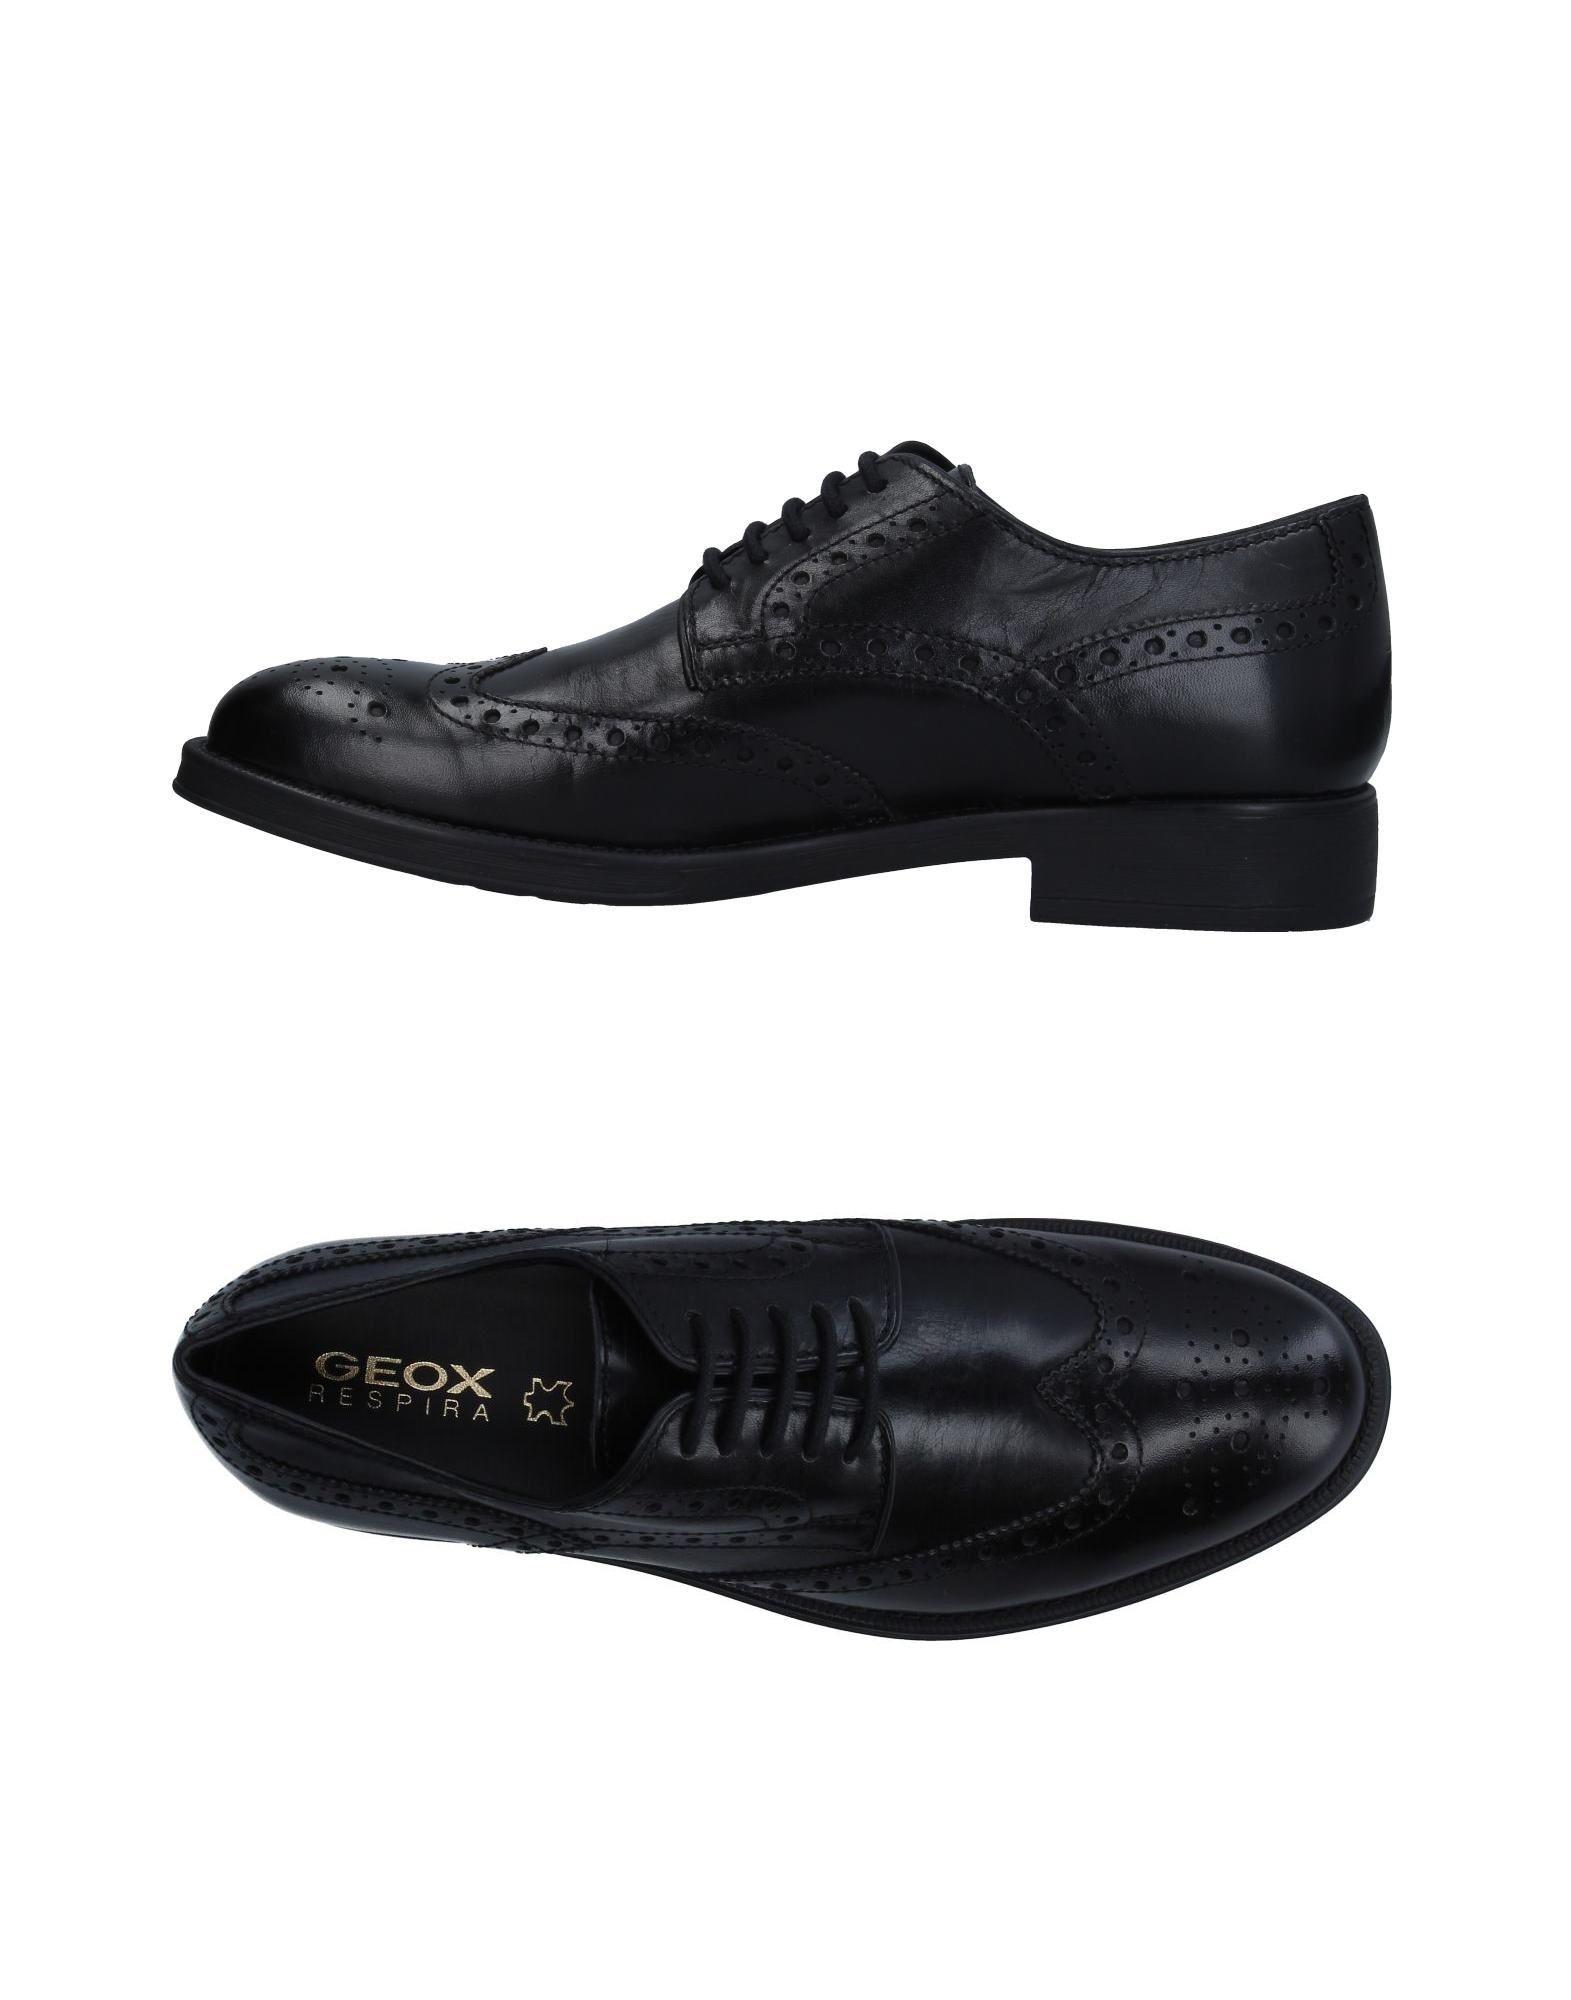 GEOX Обувь на шнурках первый внутри обувь обувь обувь обувь обувь обувь обувь обувь обувь 8a2549 мужская армия green 40 метров